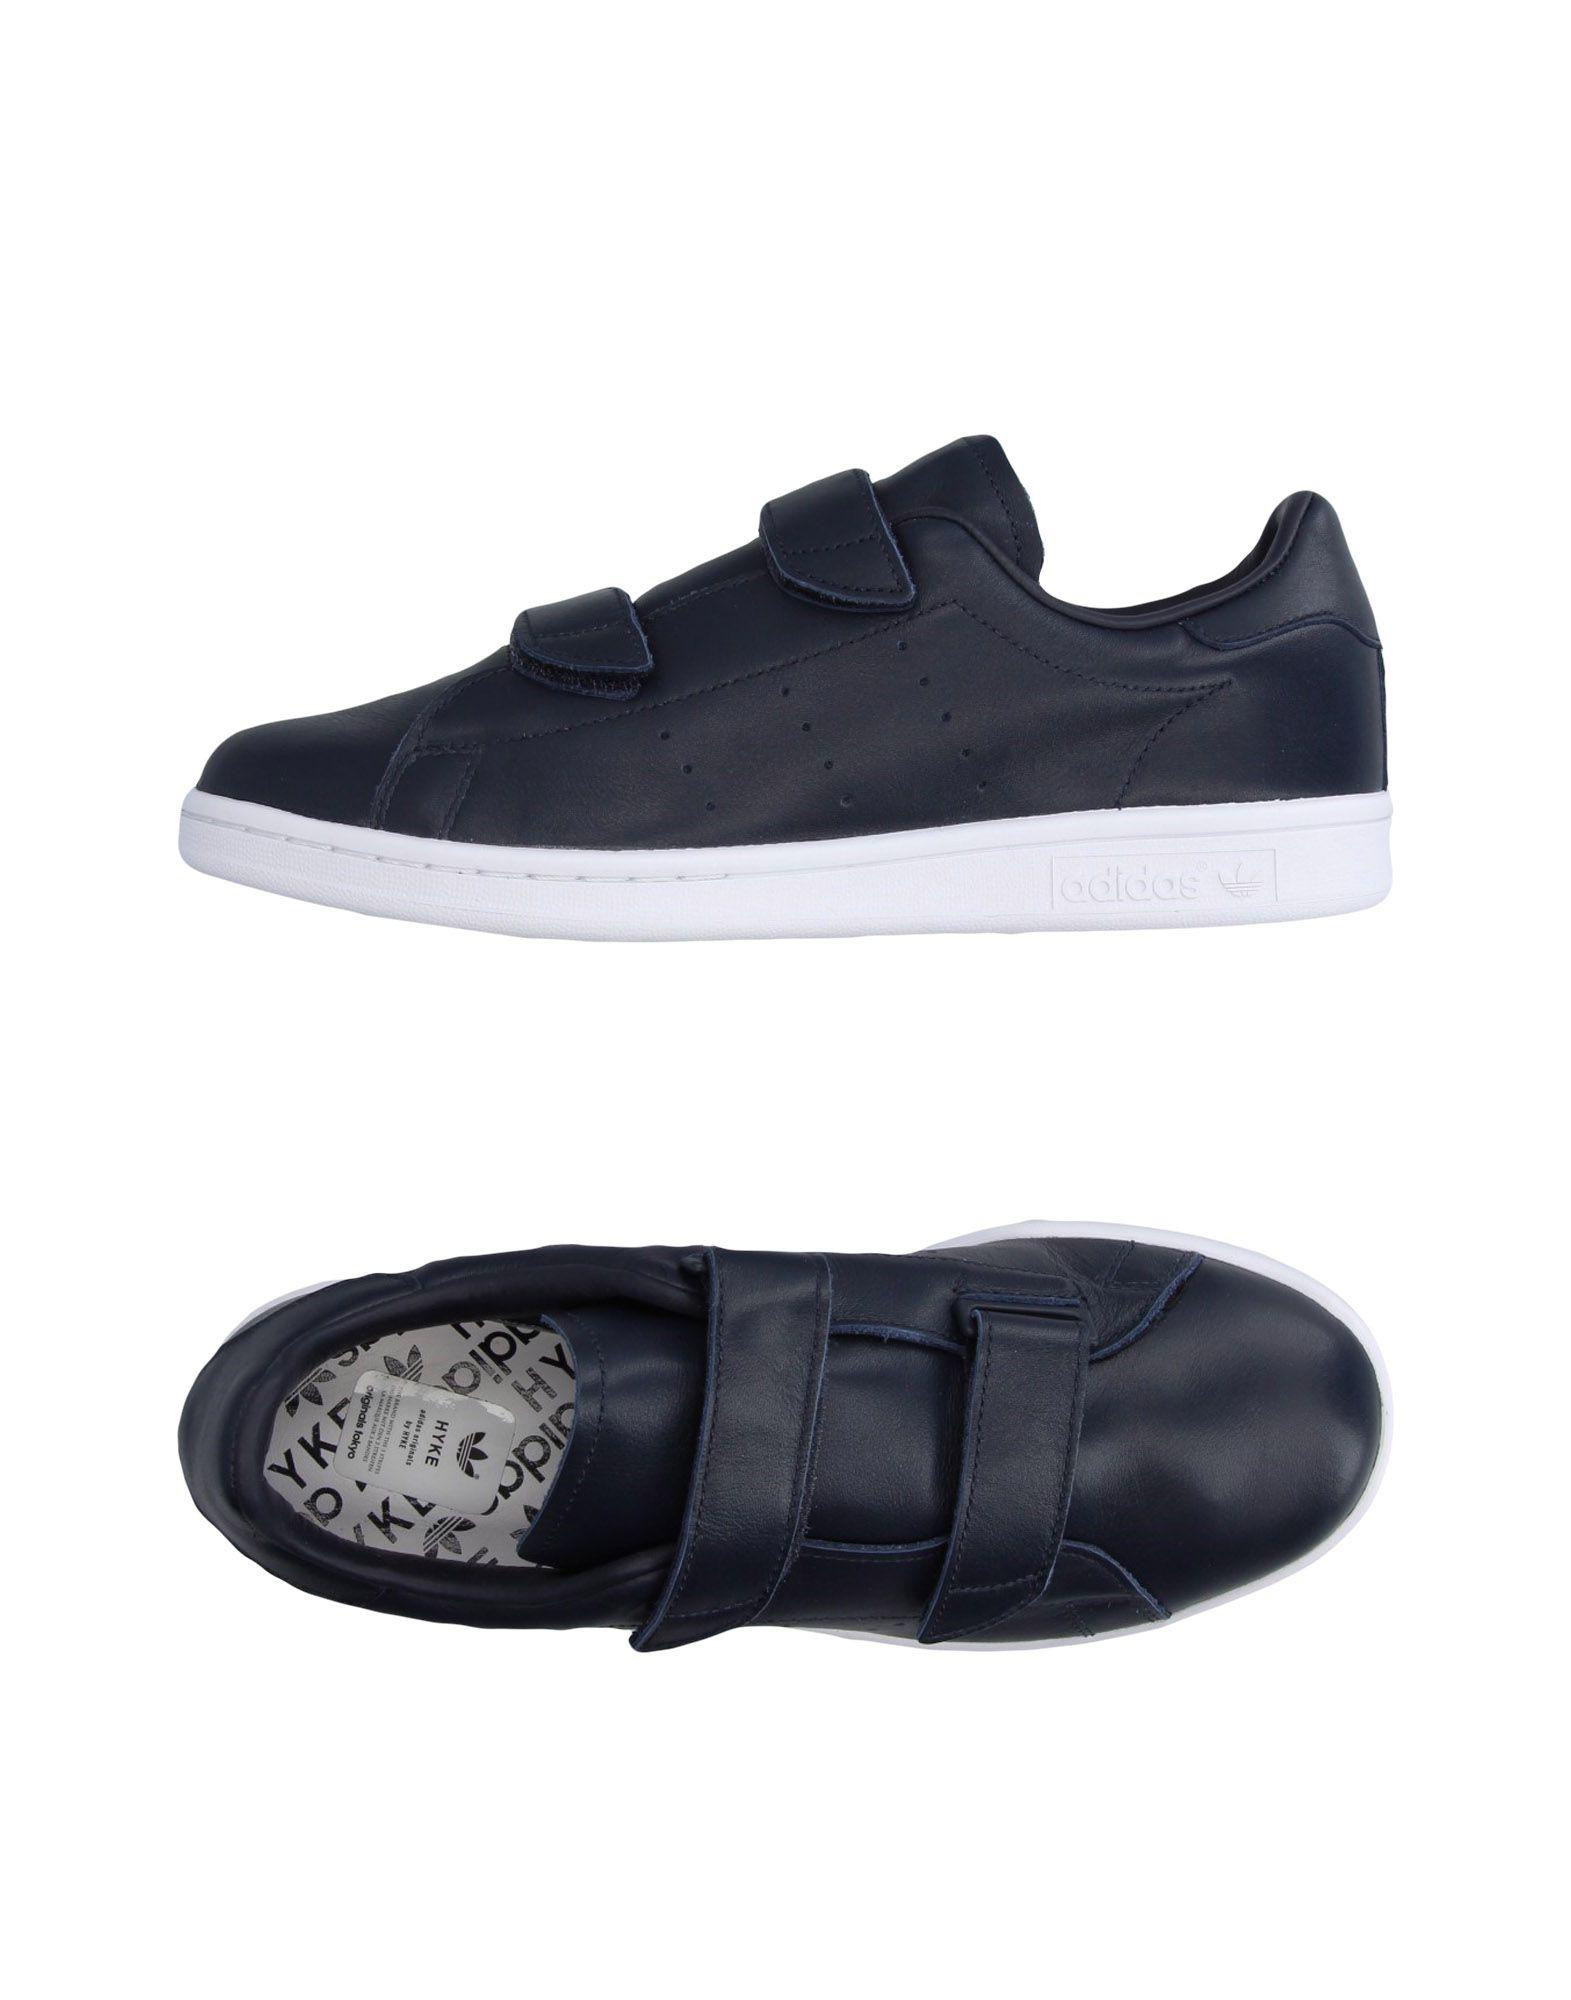 Adidas Originals By Hyke Sneakers Sneakers Sneakers Herren  11217062WN Heiße Schuhe 19e607